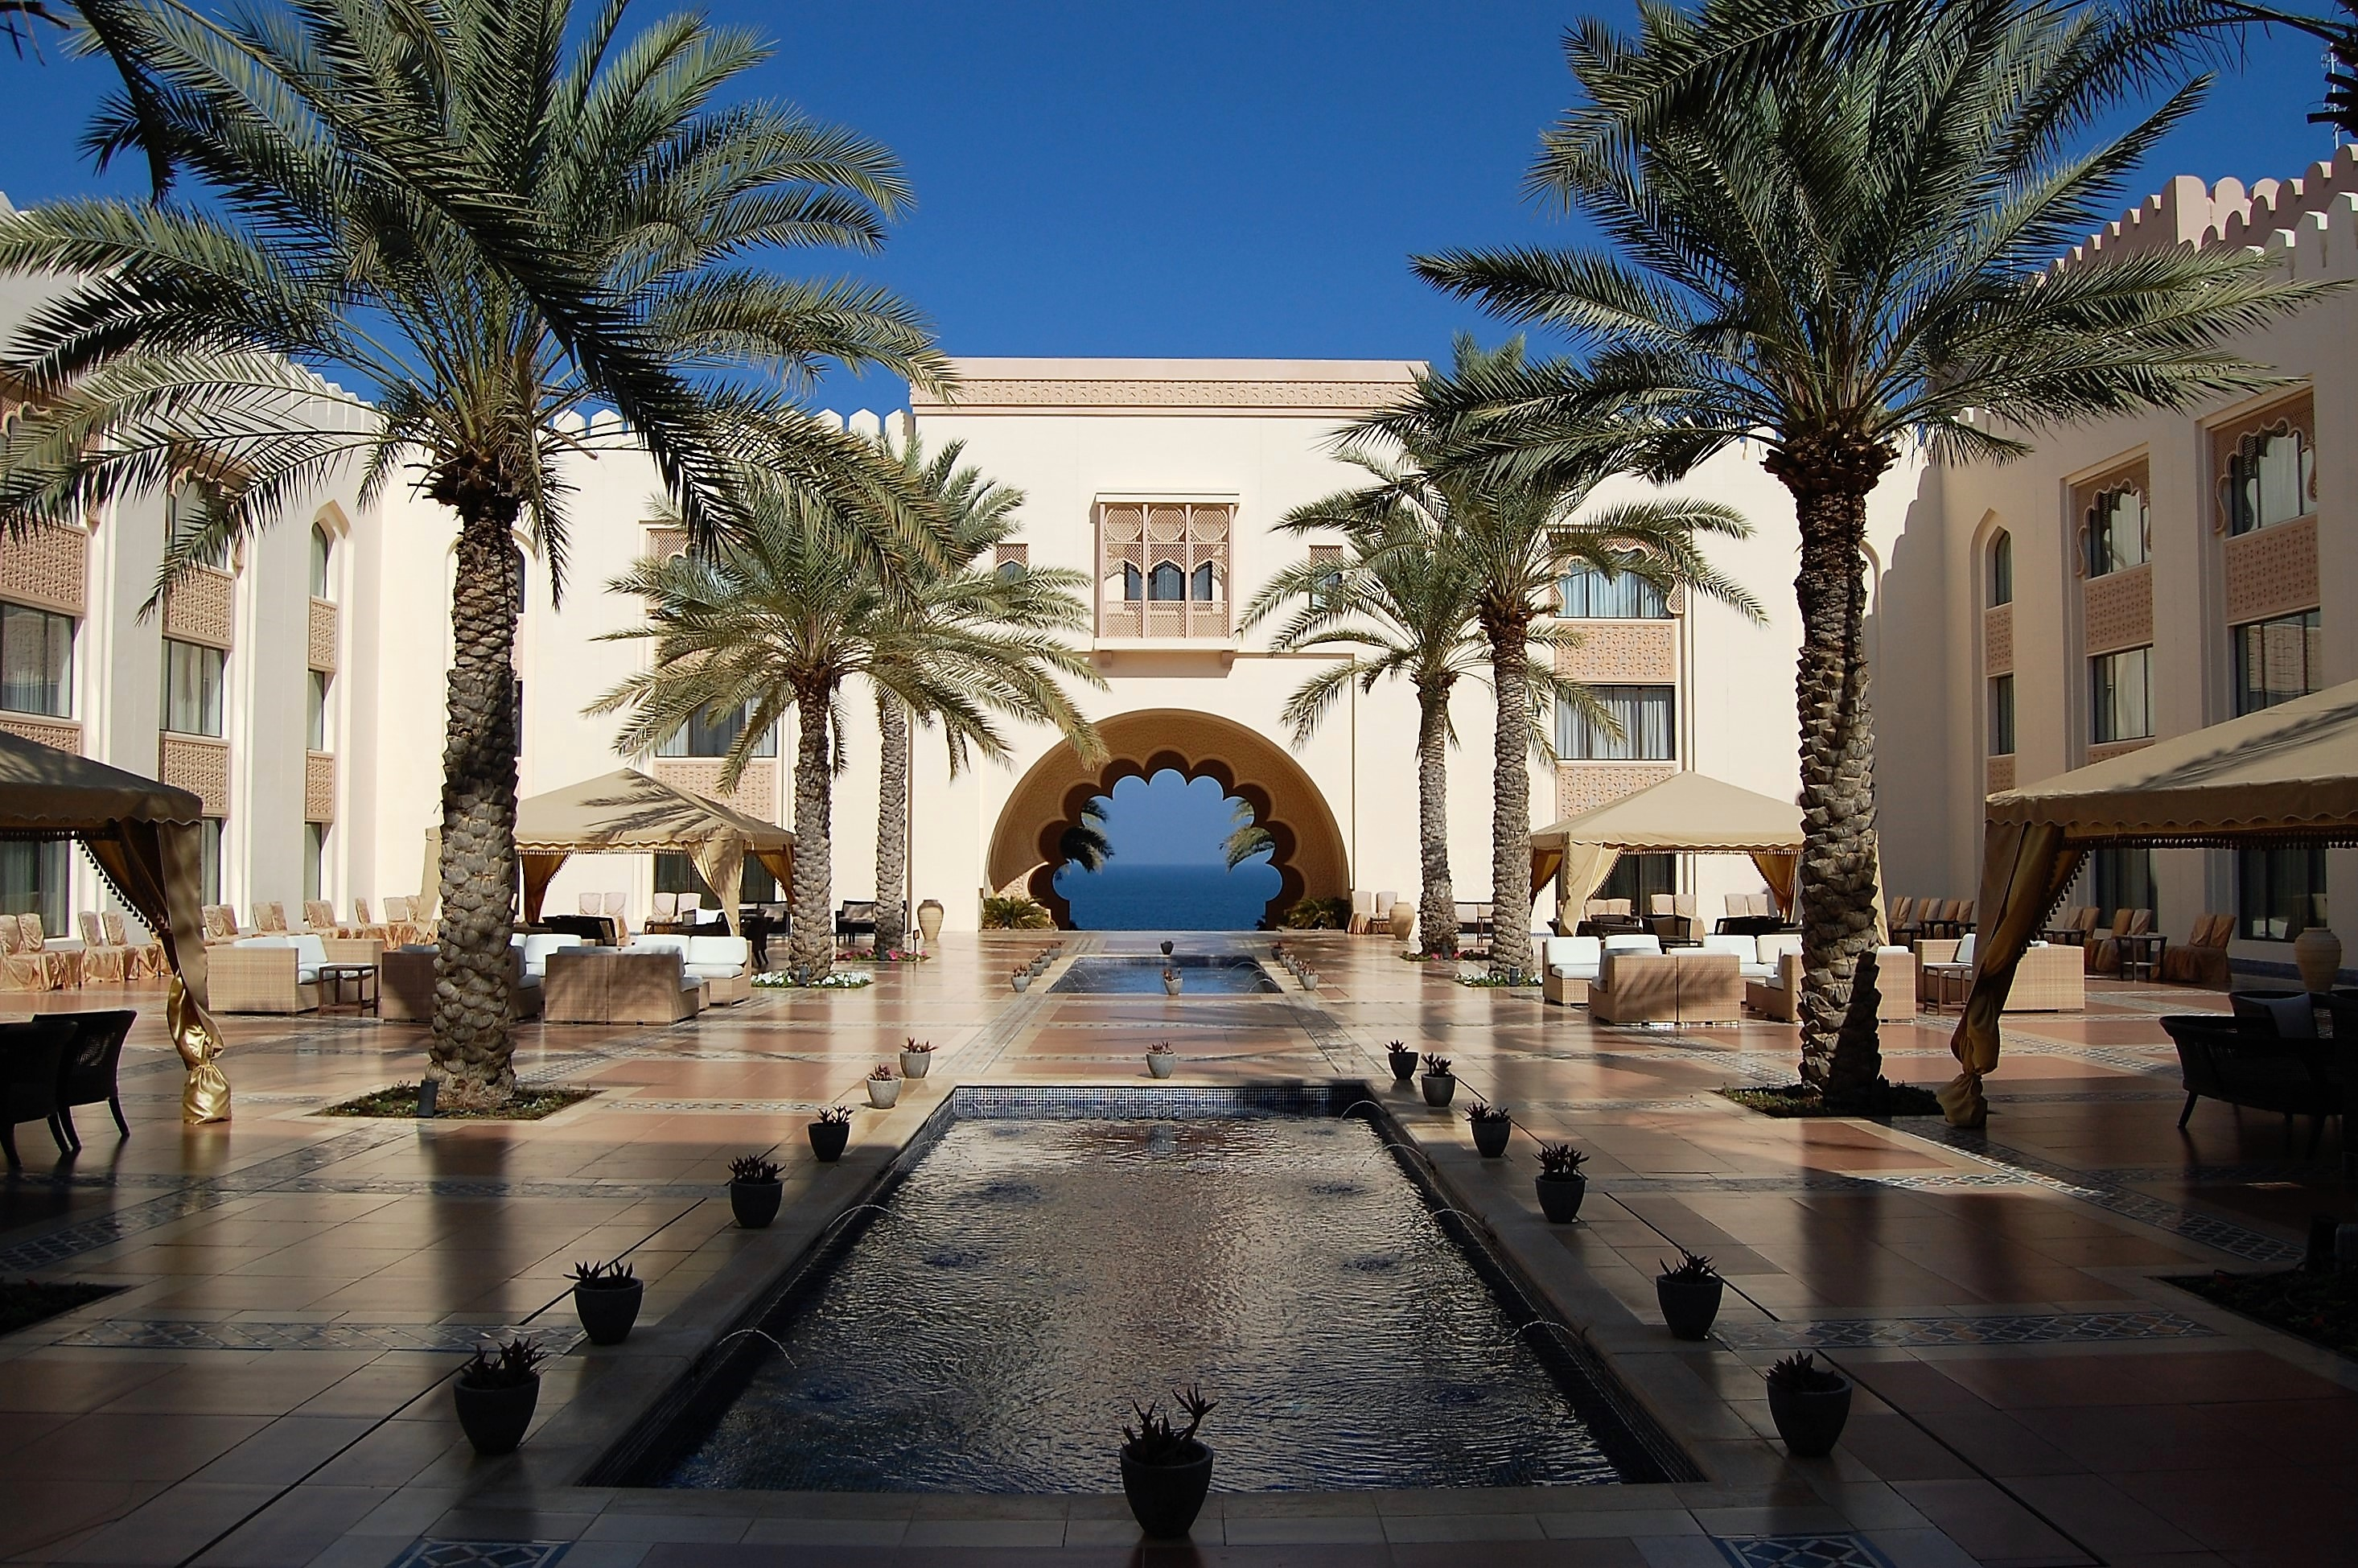 Shangri-la AL HUSN マスカットの大人のリゾート,シャングリラ アル フスンに滞在